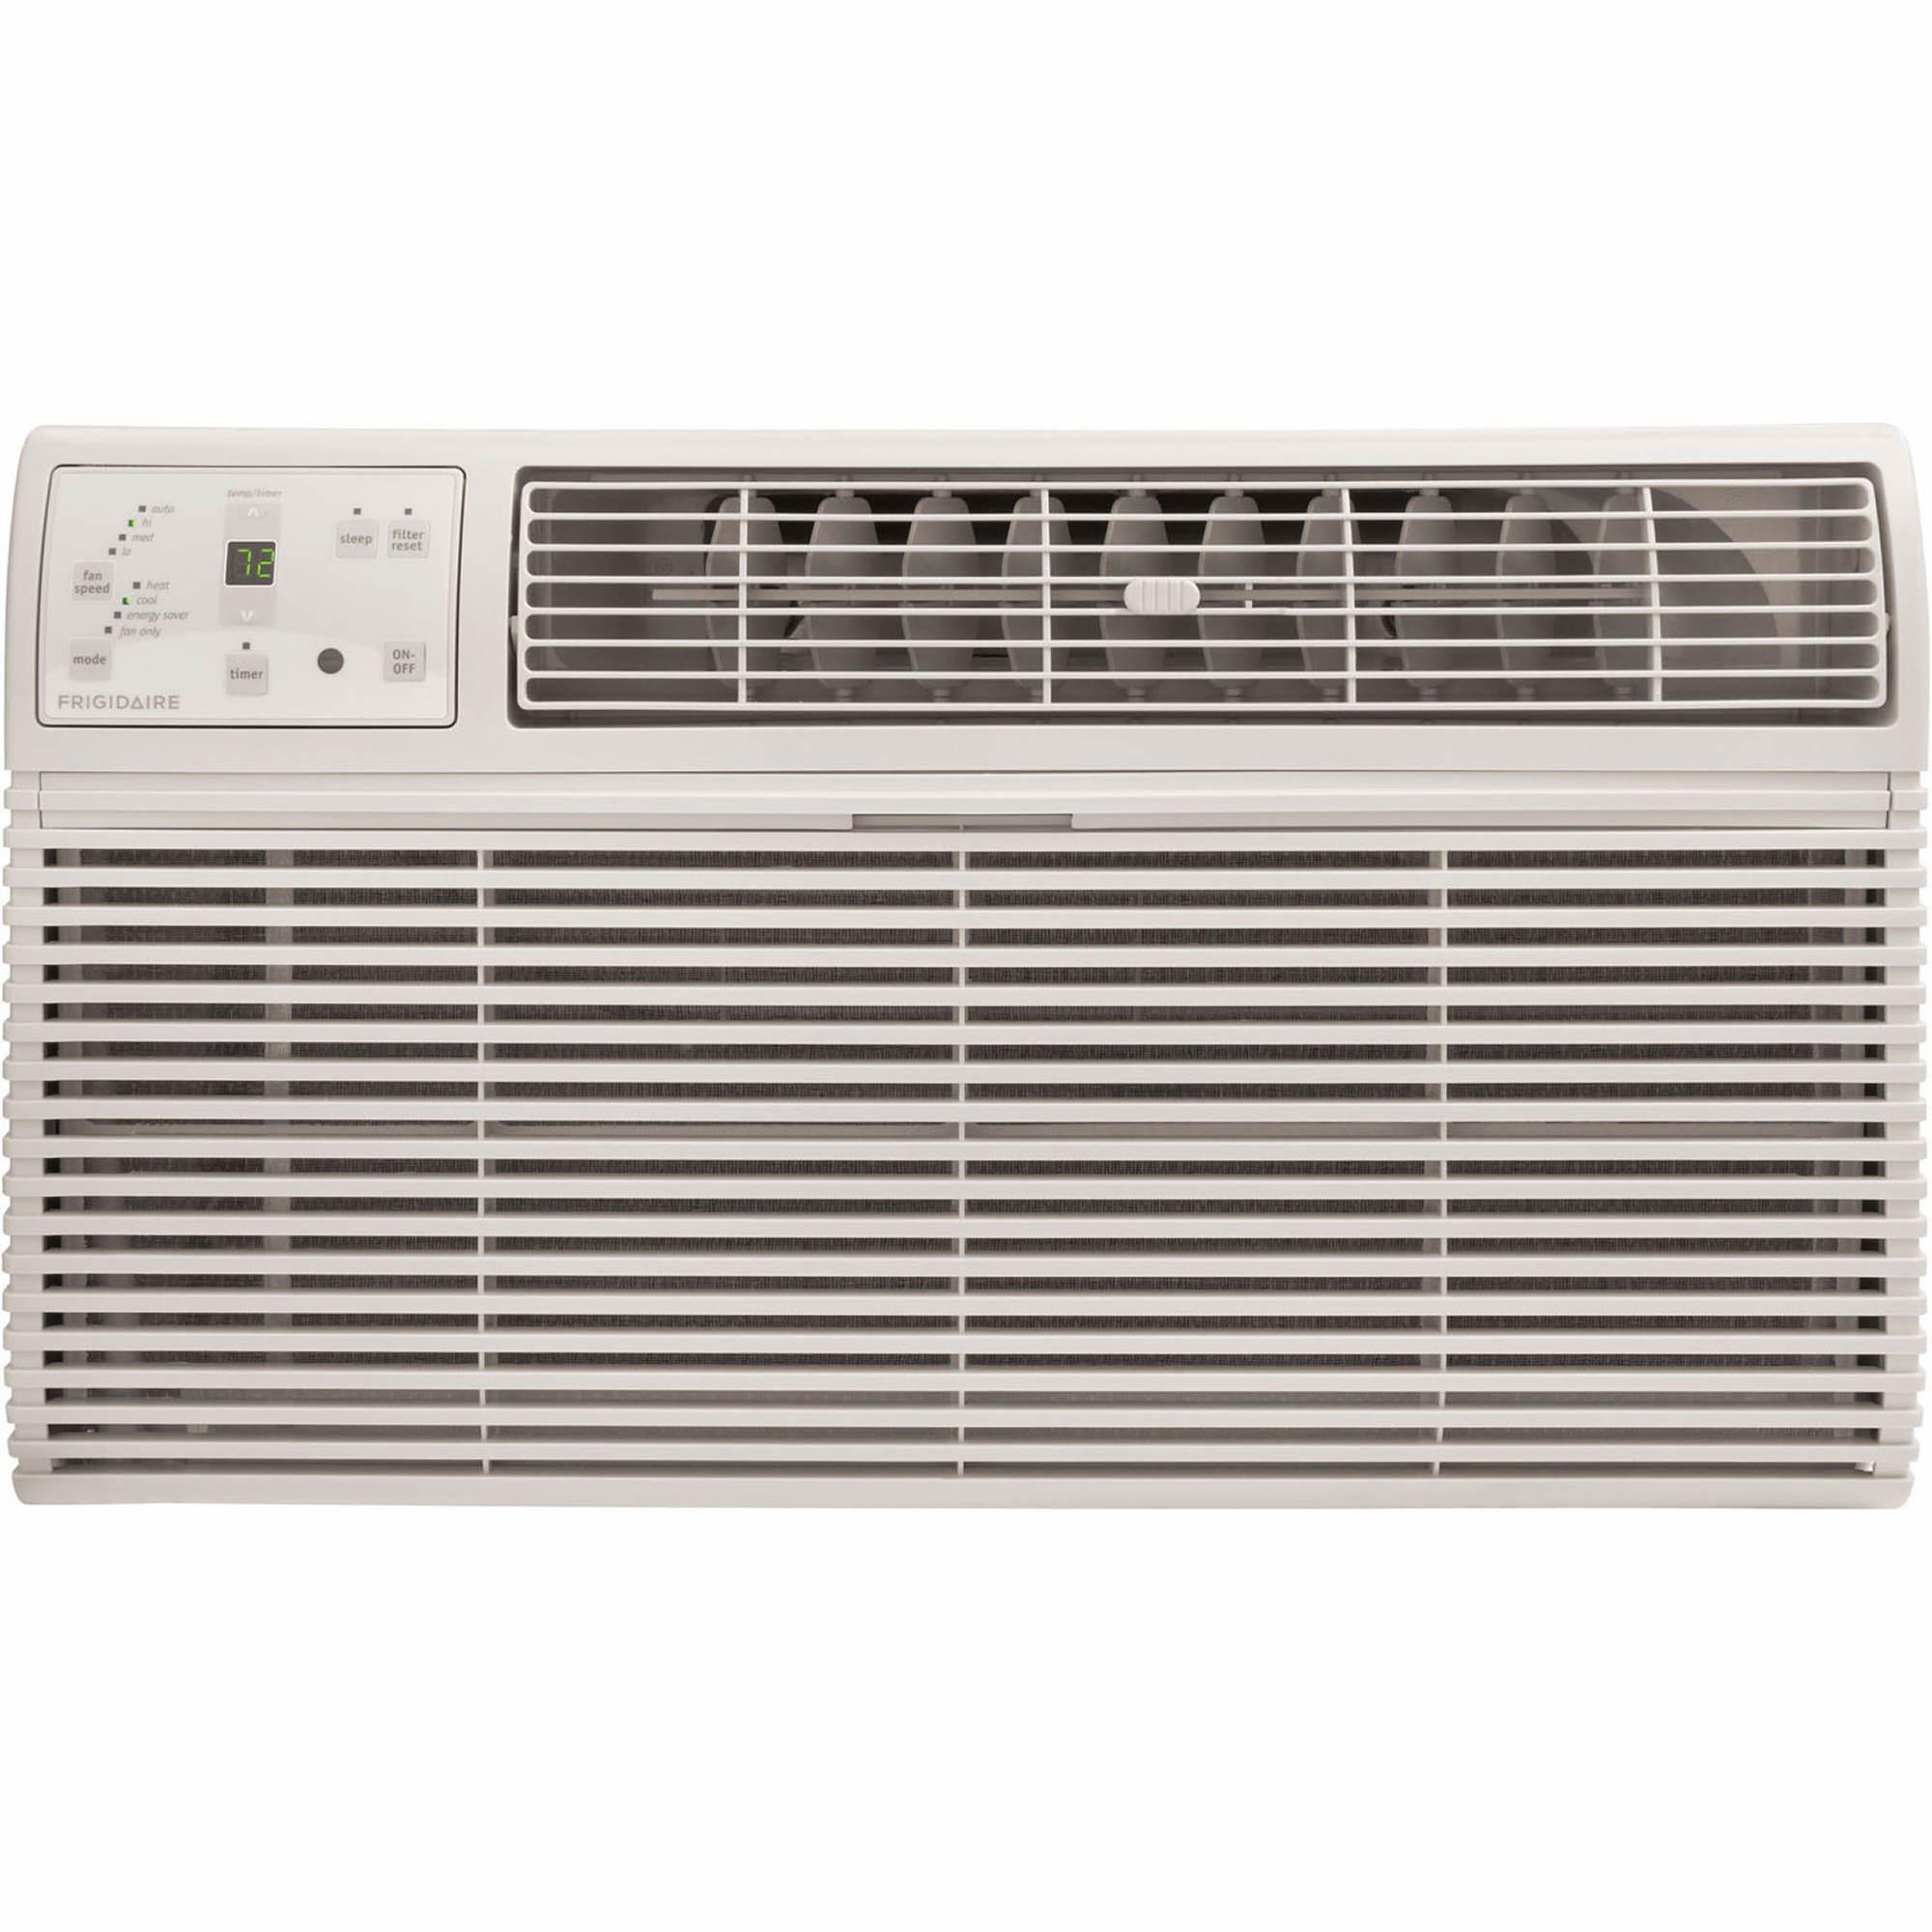 BTU Through the Wall Air Conditioner (230V) BJs Wholesale Club #68804B